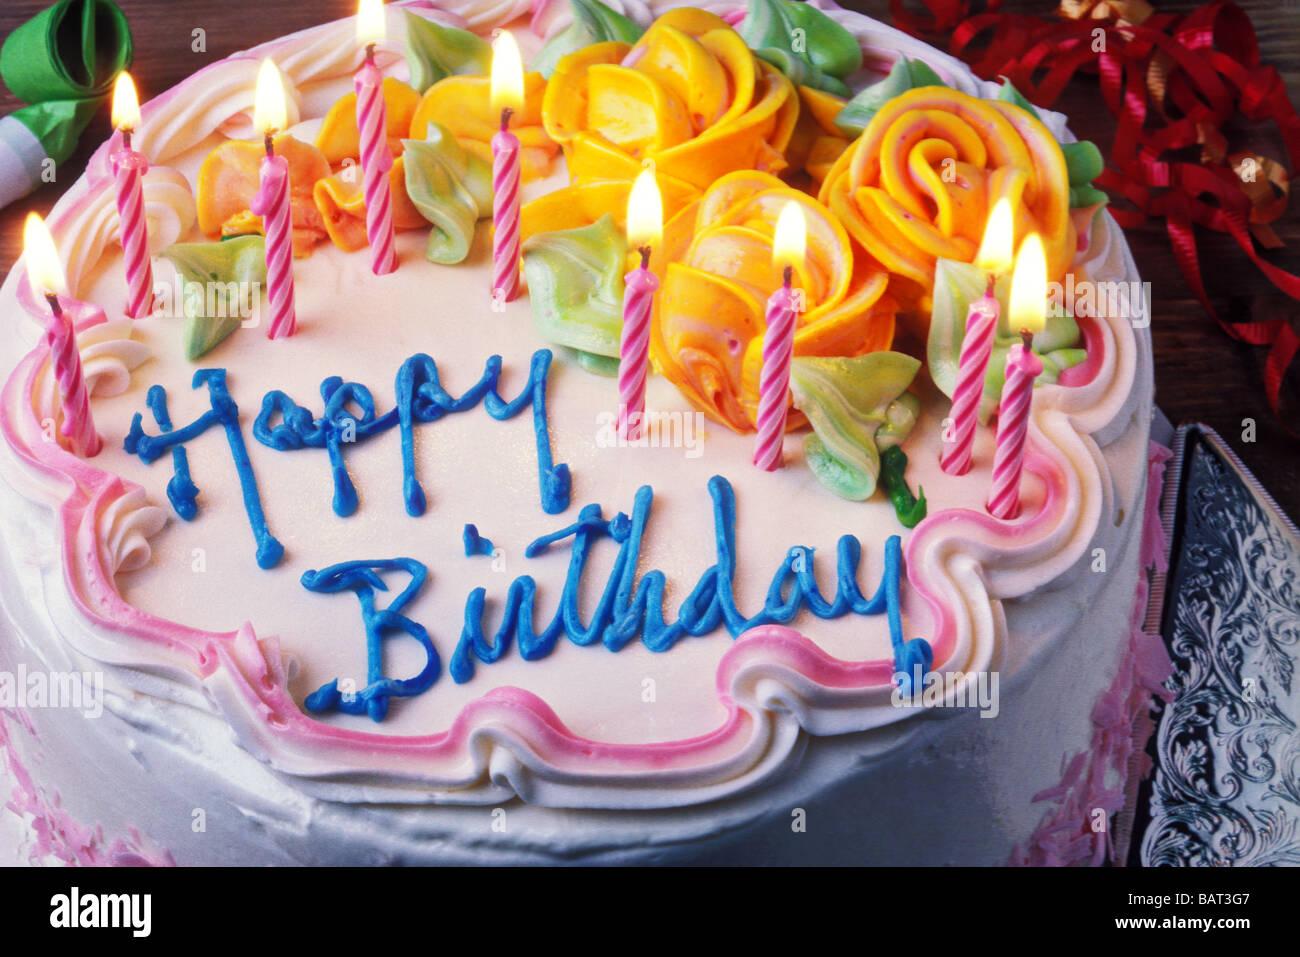 Happy Birthday cake with candles Stock Photo 23886583 , Alamy